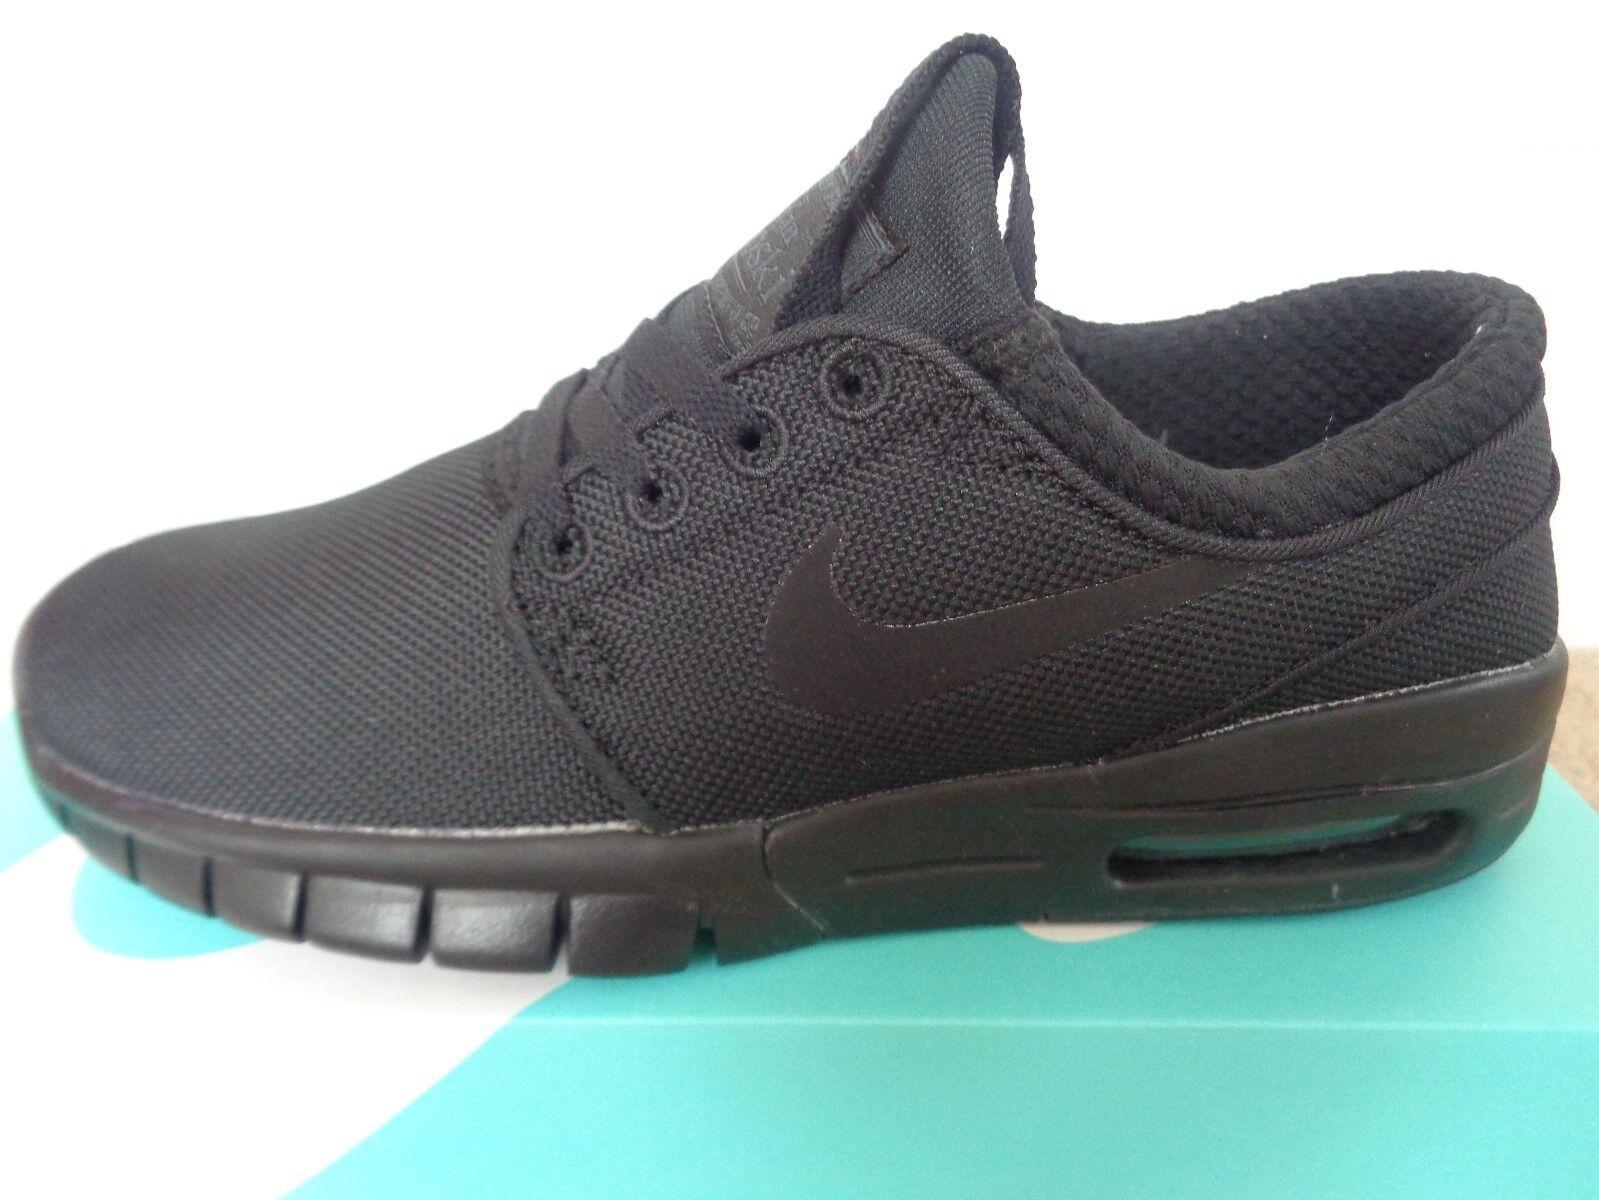 Nike sb stefan janoski max ausbilder turnschuhe 631303 008 eu 36,5 uns 4.5 neue